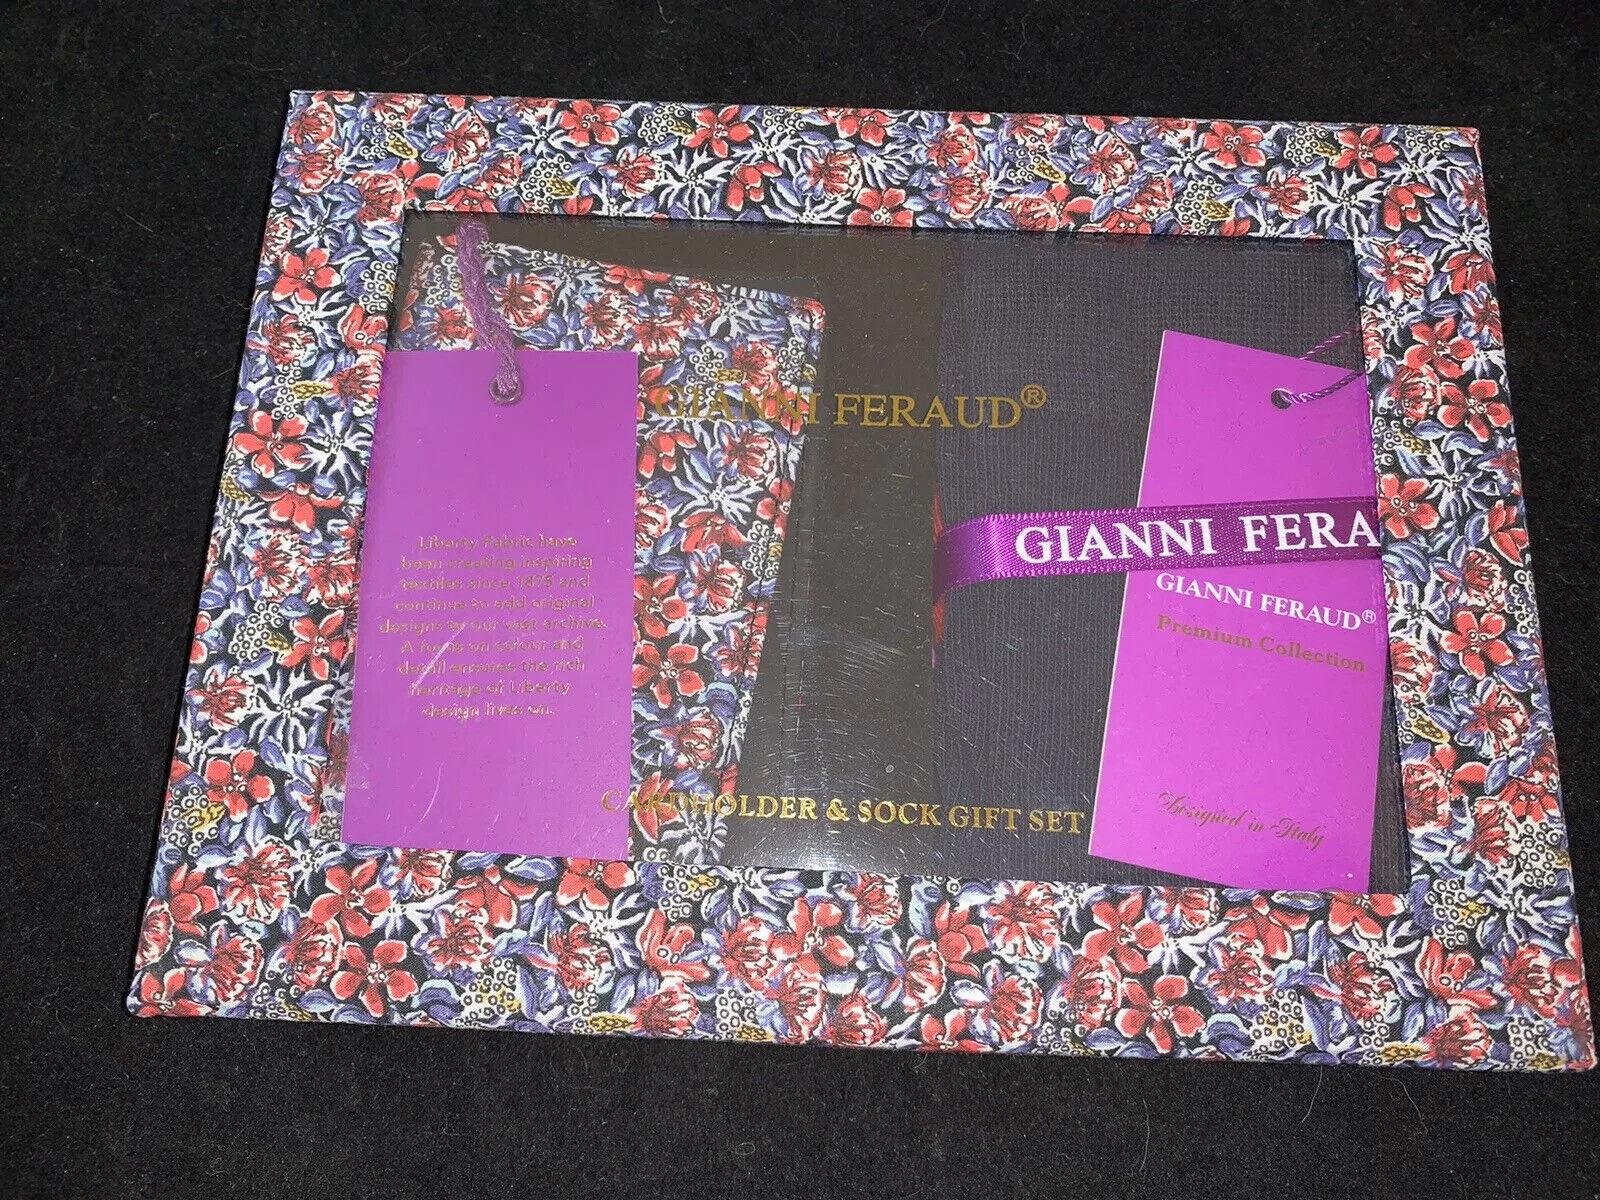 BNIB GIANNI FERAUD CARD HOLDER WALLET With Socks In Gift Box Set RRP